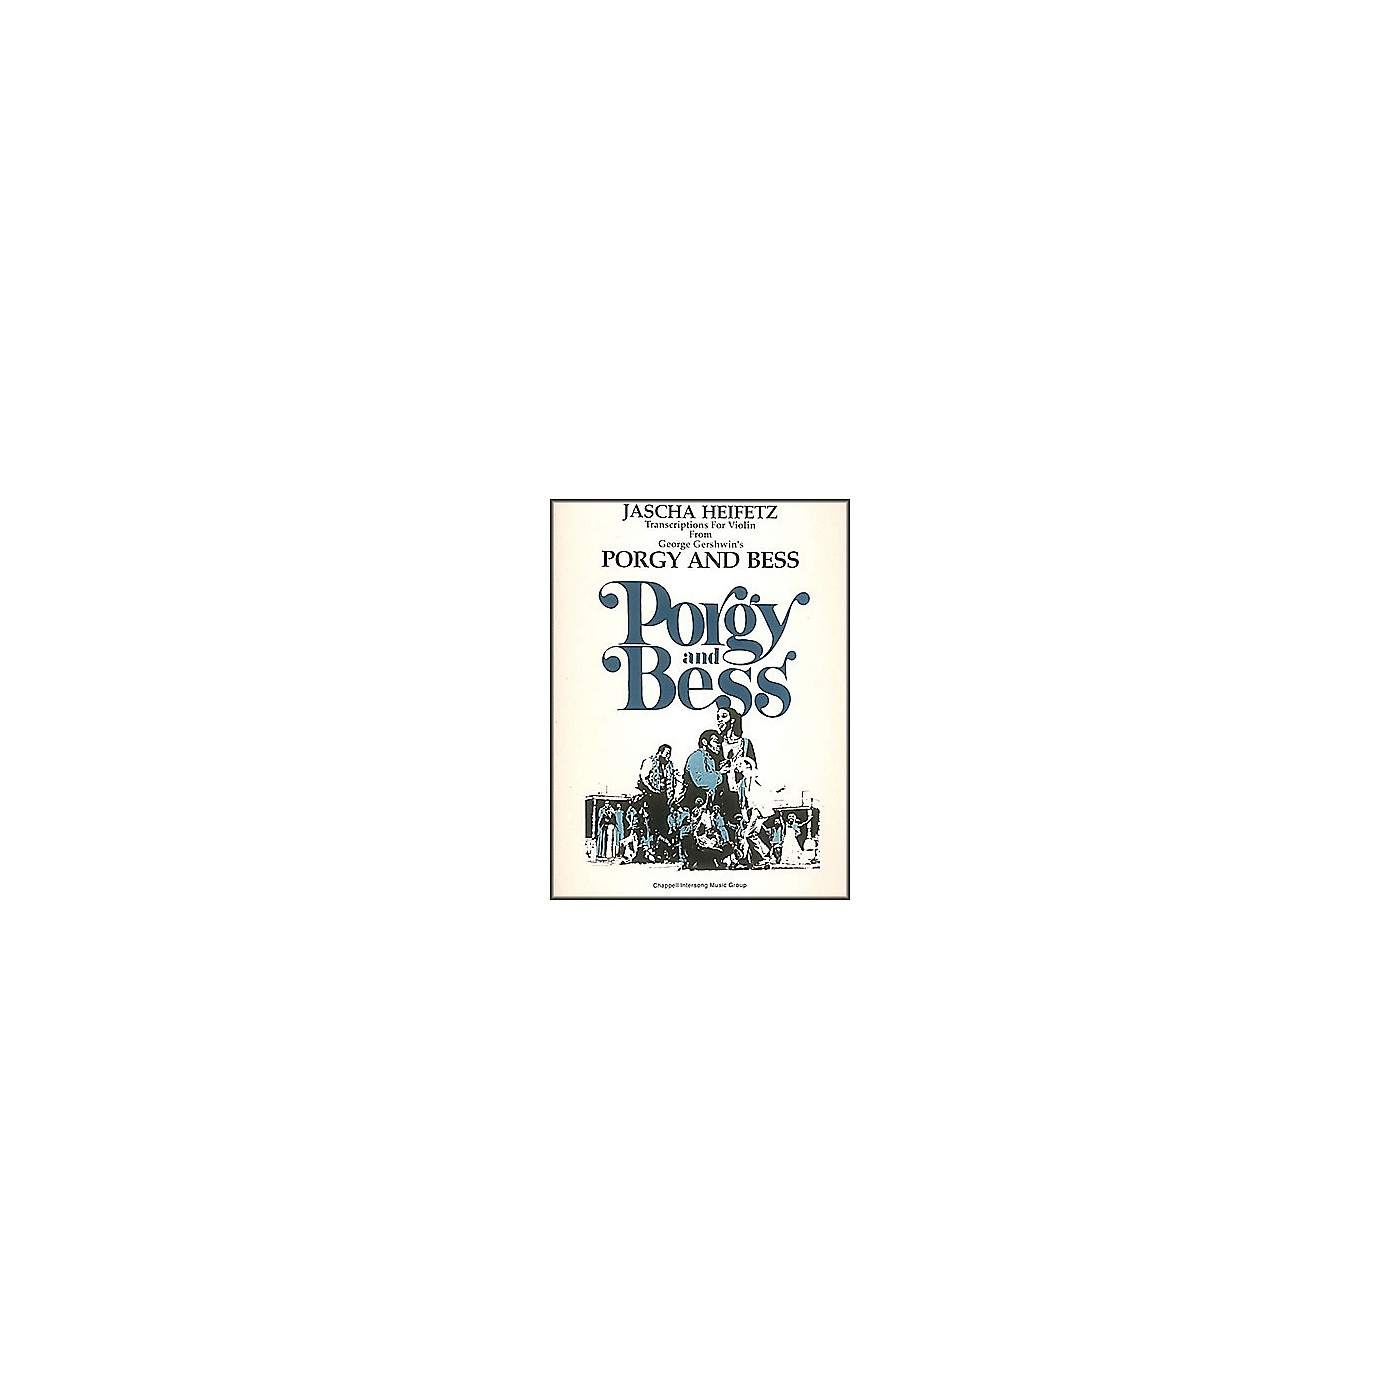 Hal Leonard Porgy And Bess Violin And Piano thumbnail